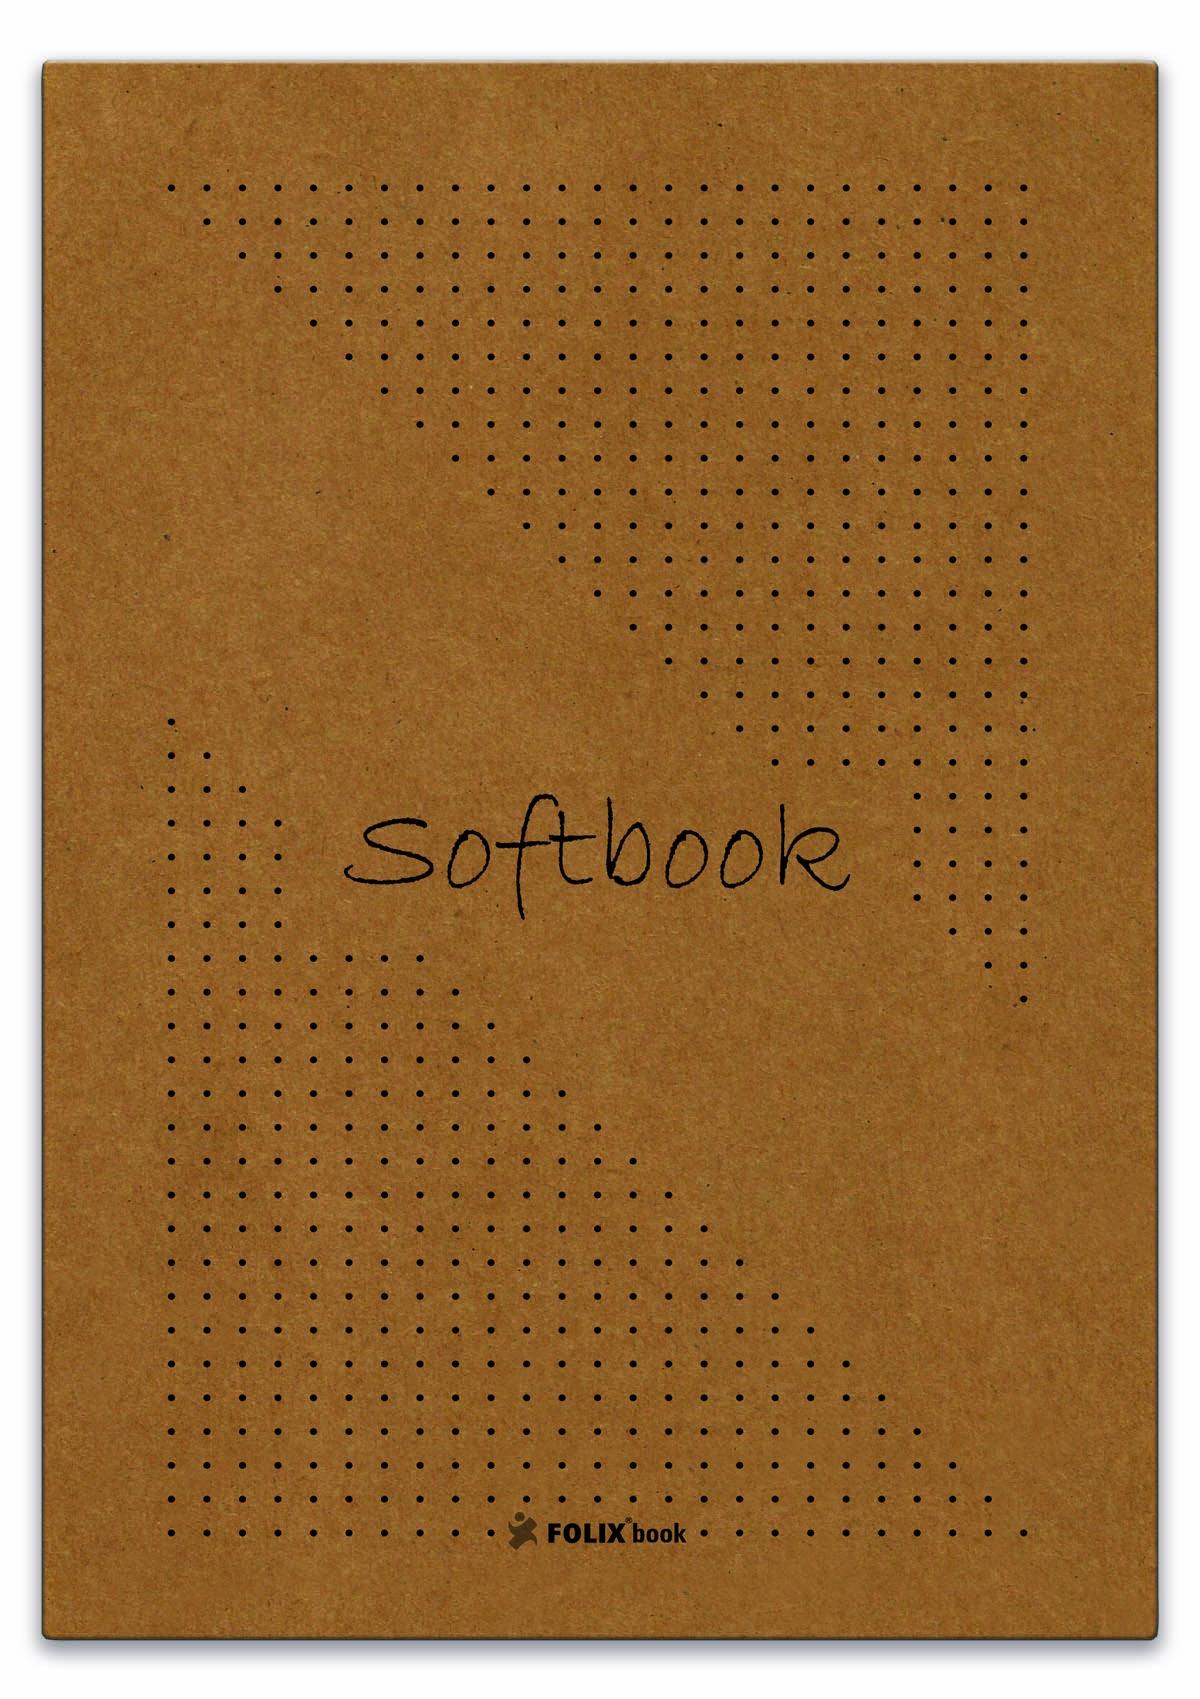 Softbook 15,5x23 cm Tel Dikiş Defter